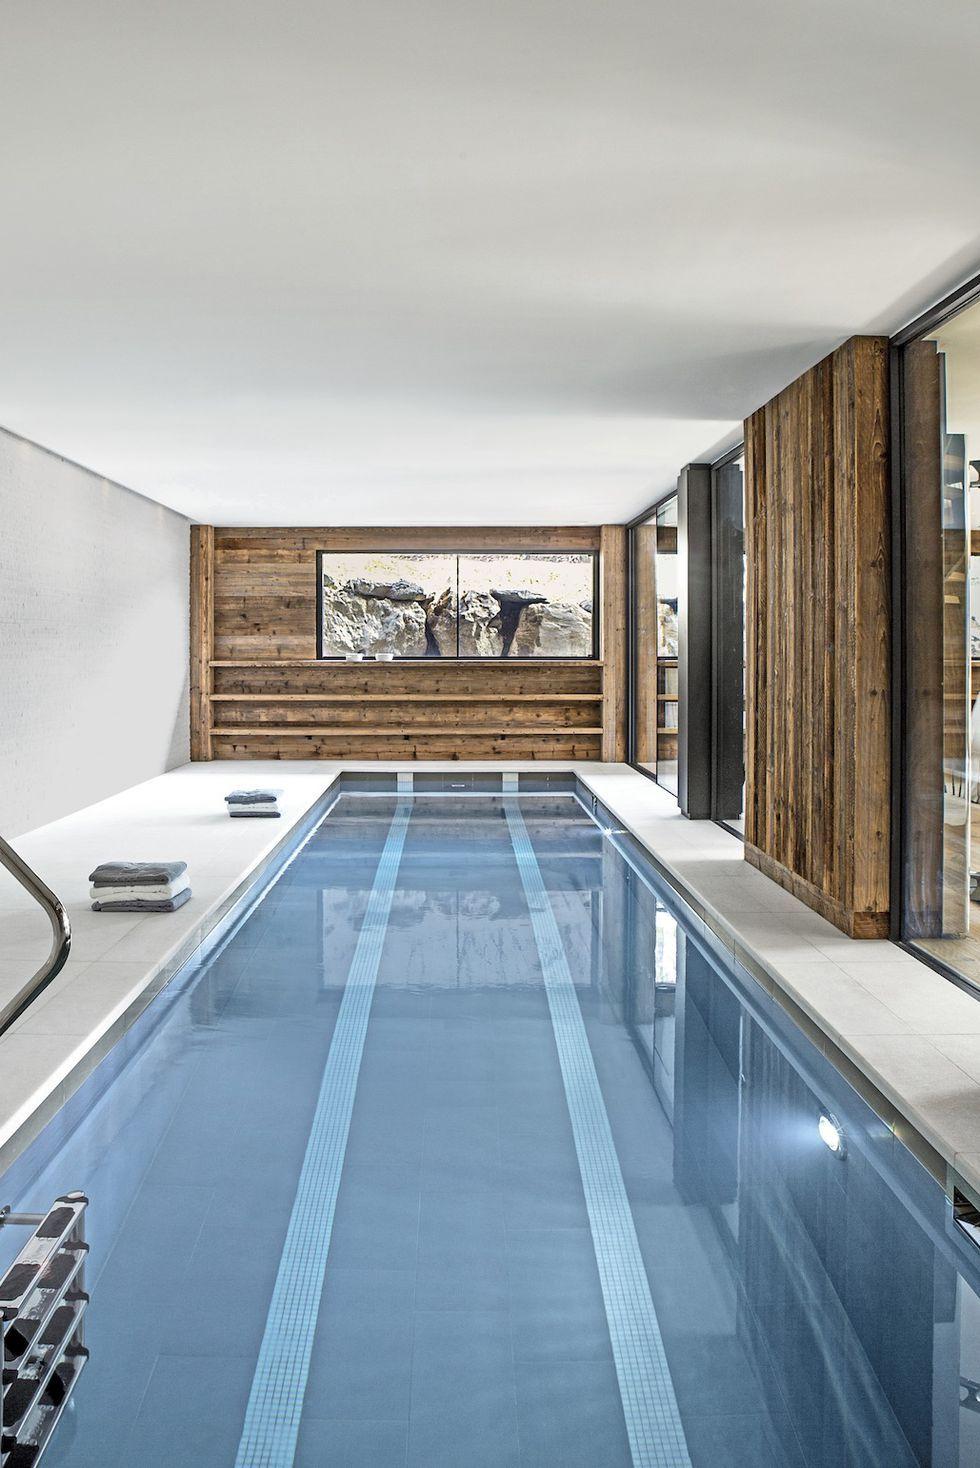 25 stunning swimming pool designs ideas for inground pools rh elledecor com